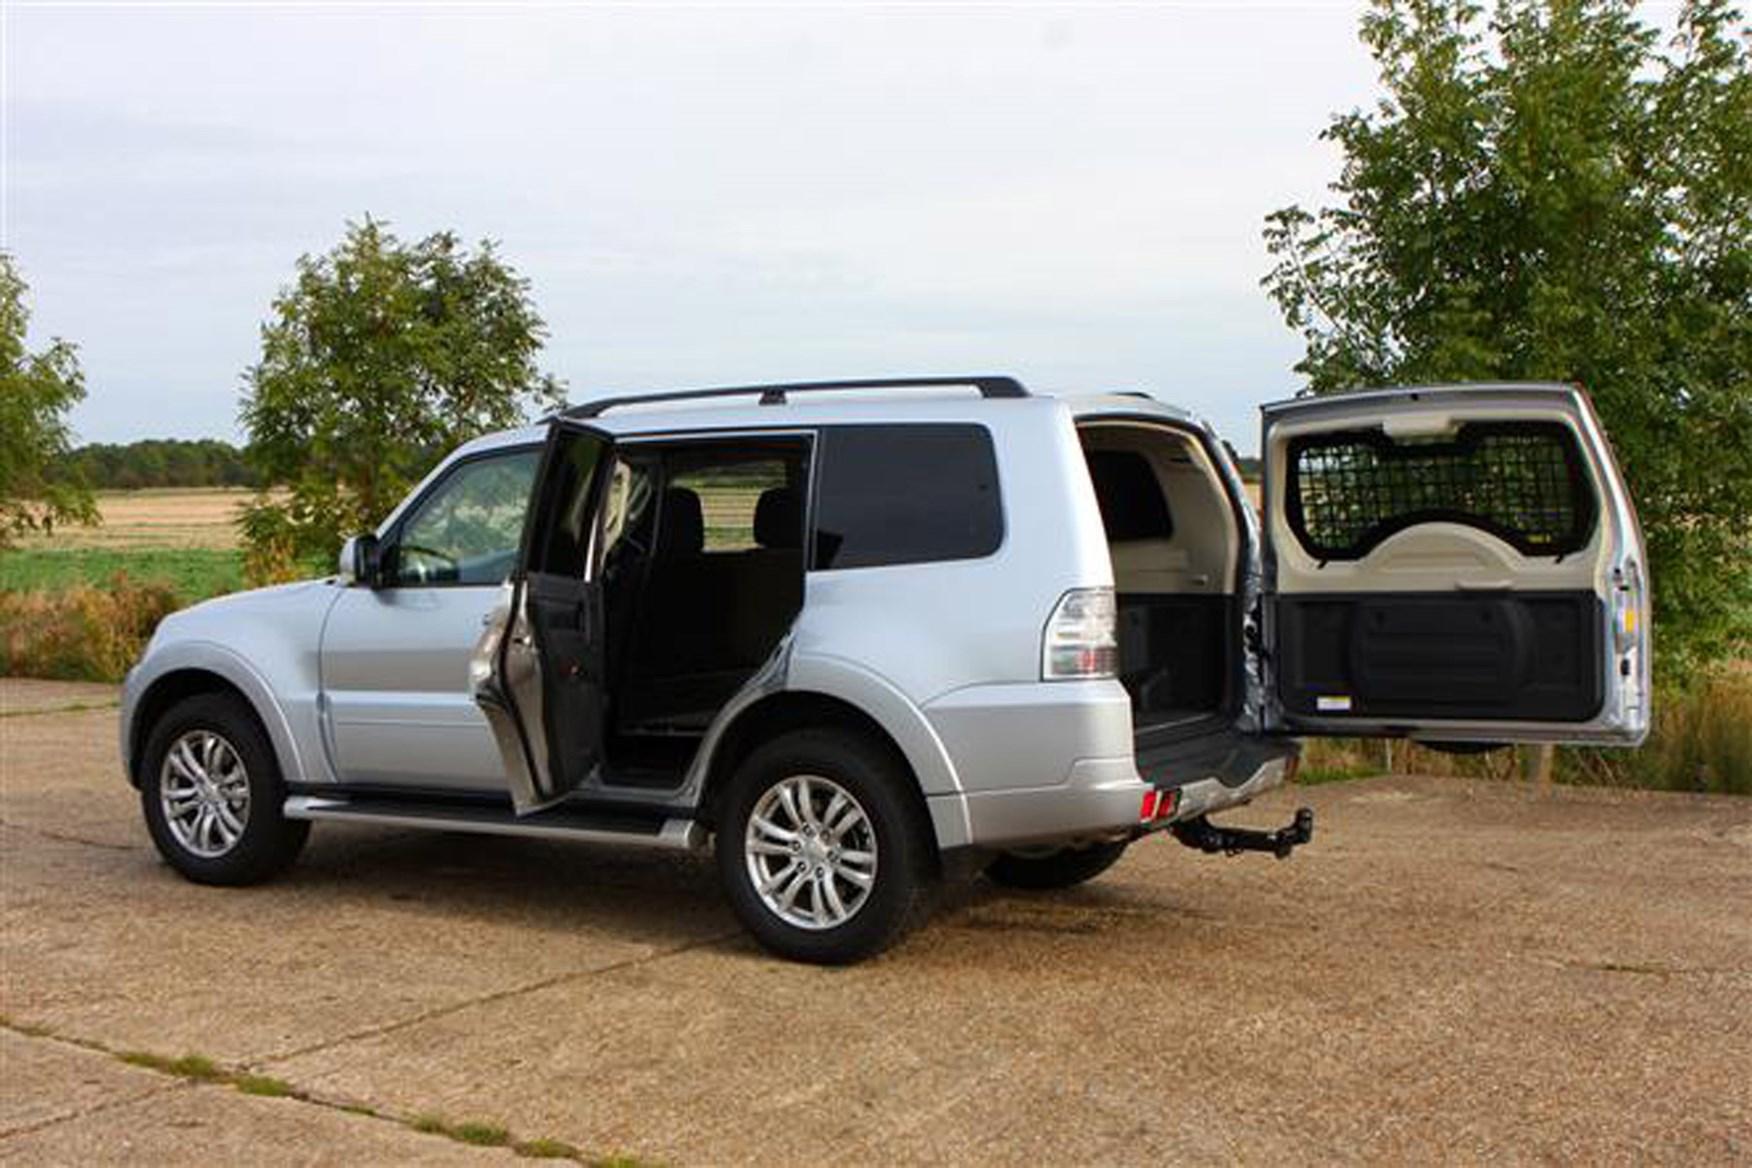 Mitsubishi Shogun review on Parkers Vans - load area acces